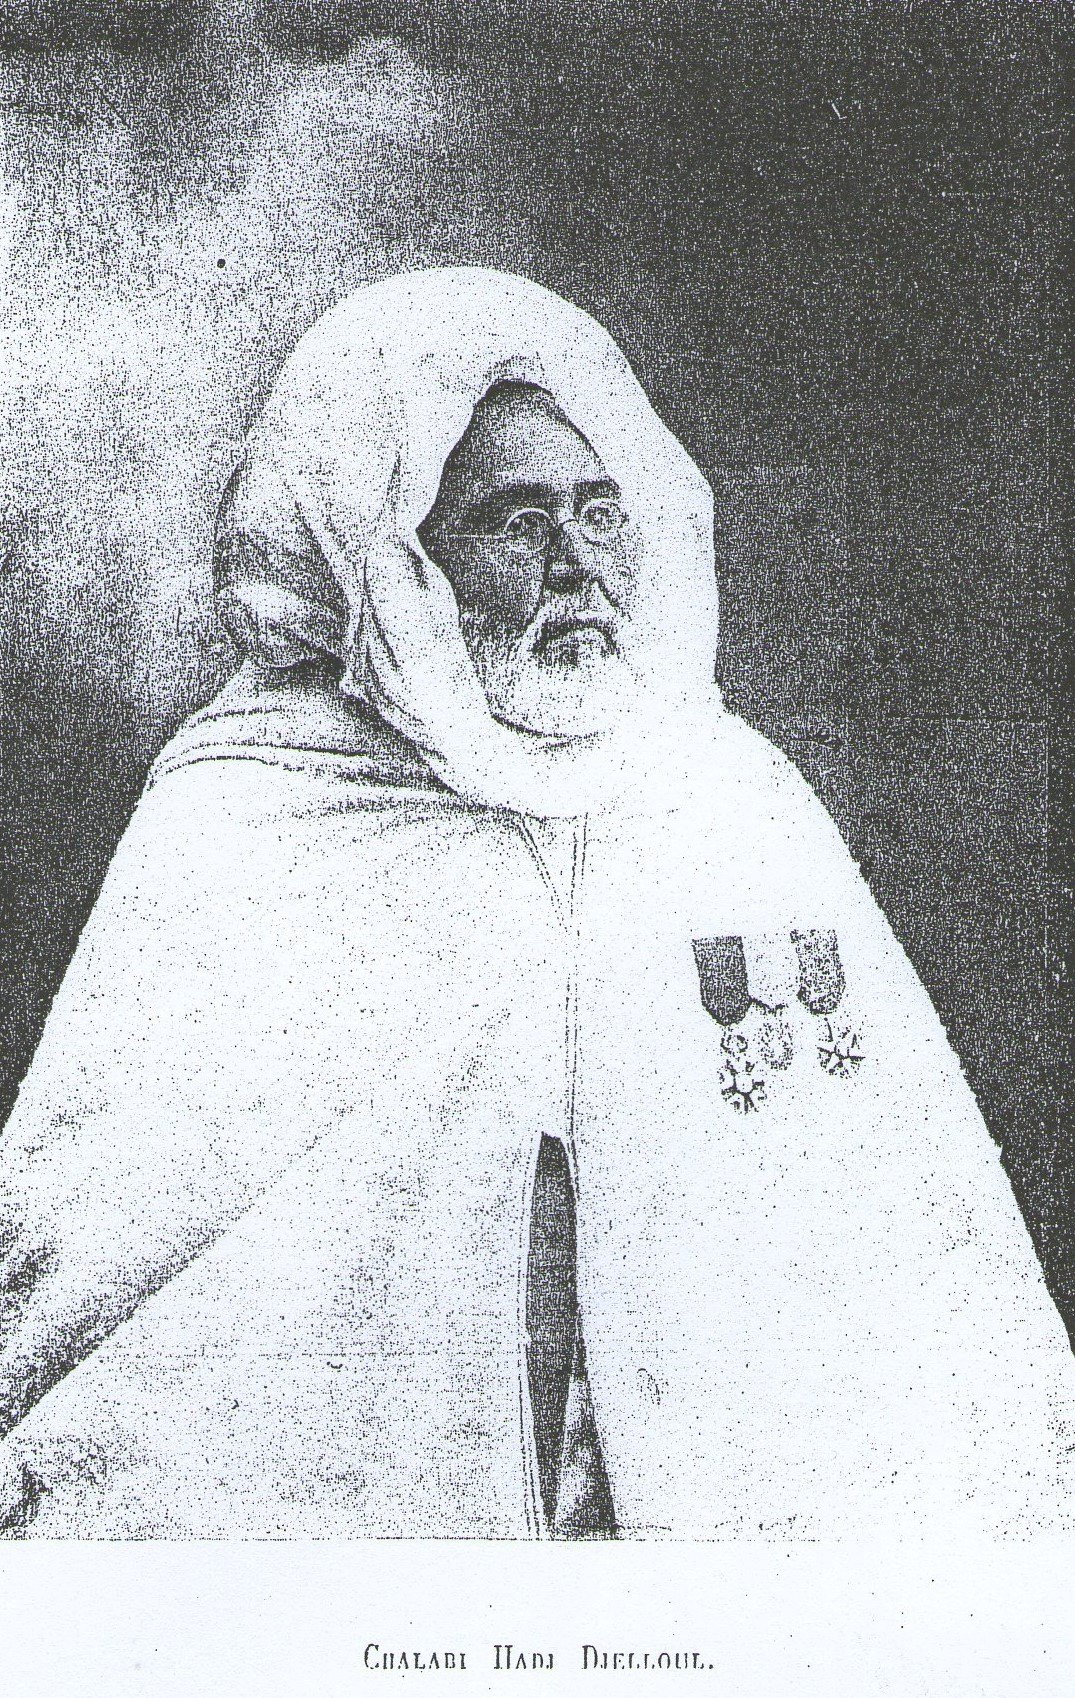 Cheikh Hadj Djelloul Chalabi. Mufti de Tlemcen